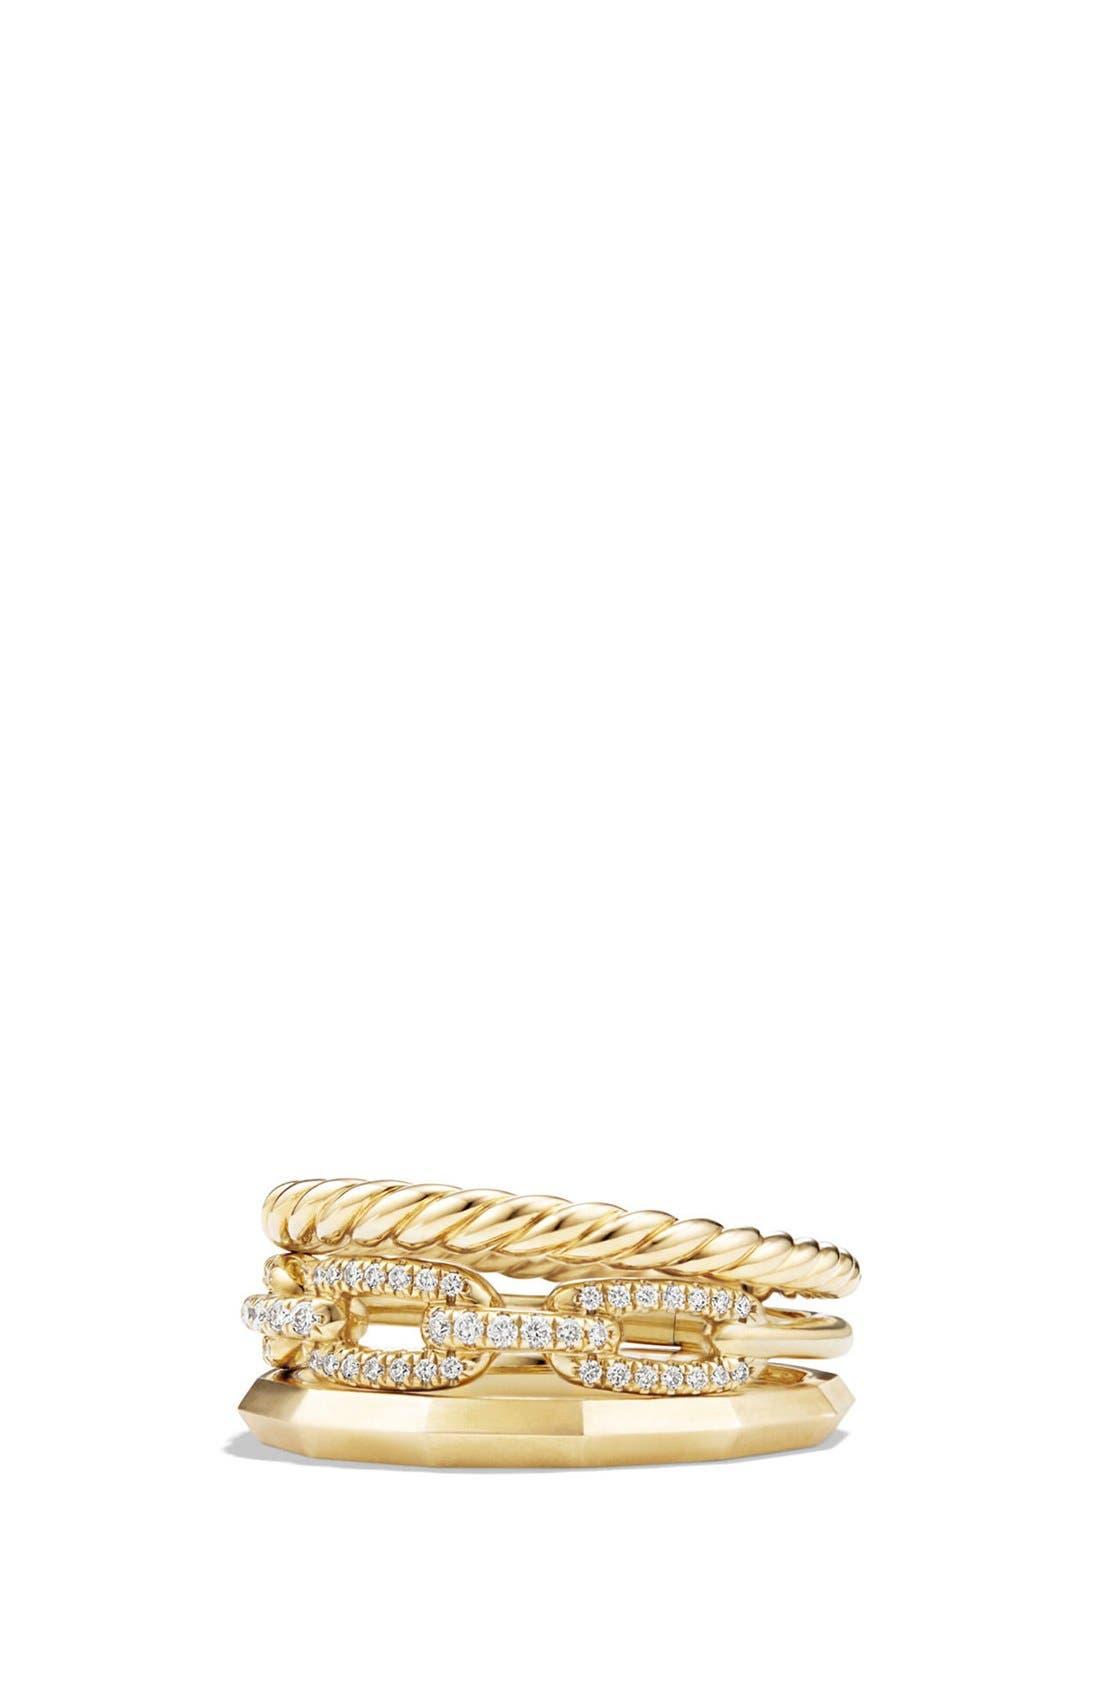 'Stax' Narrow Diamond Ring,                         Main,                         color, Yellow Gold